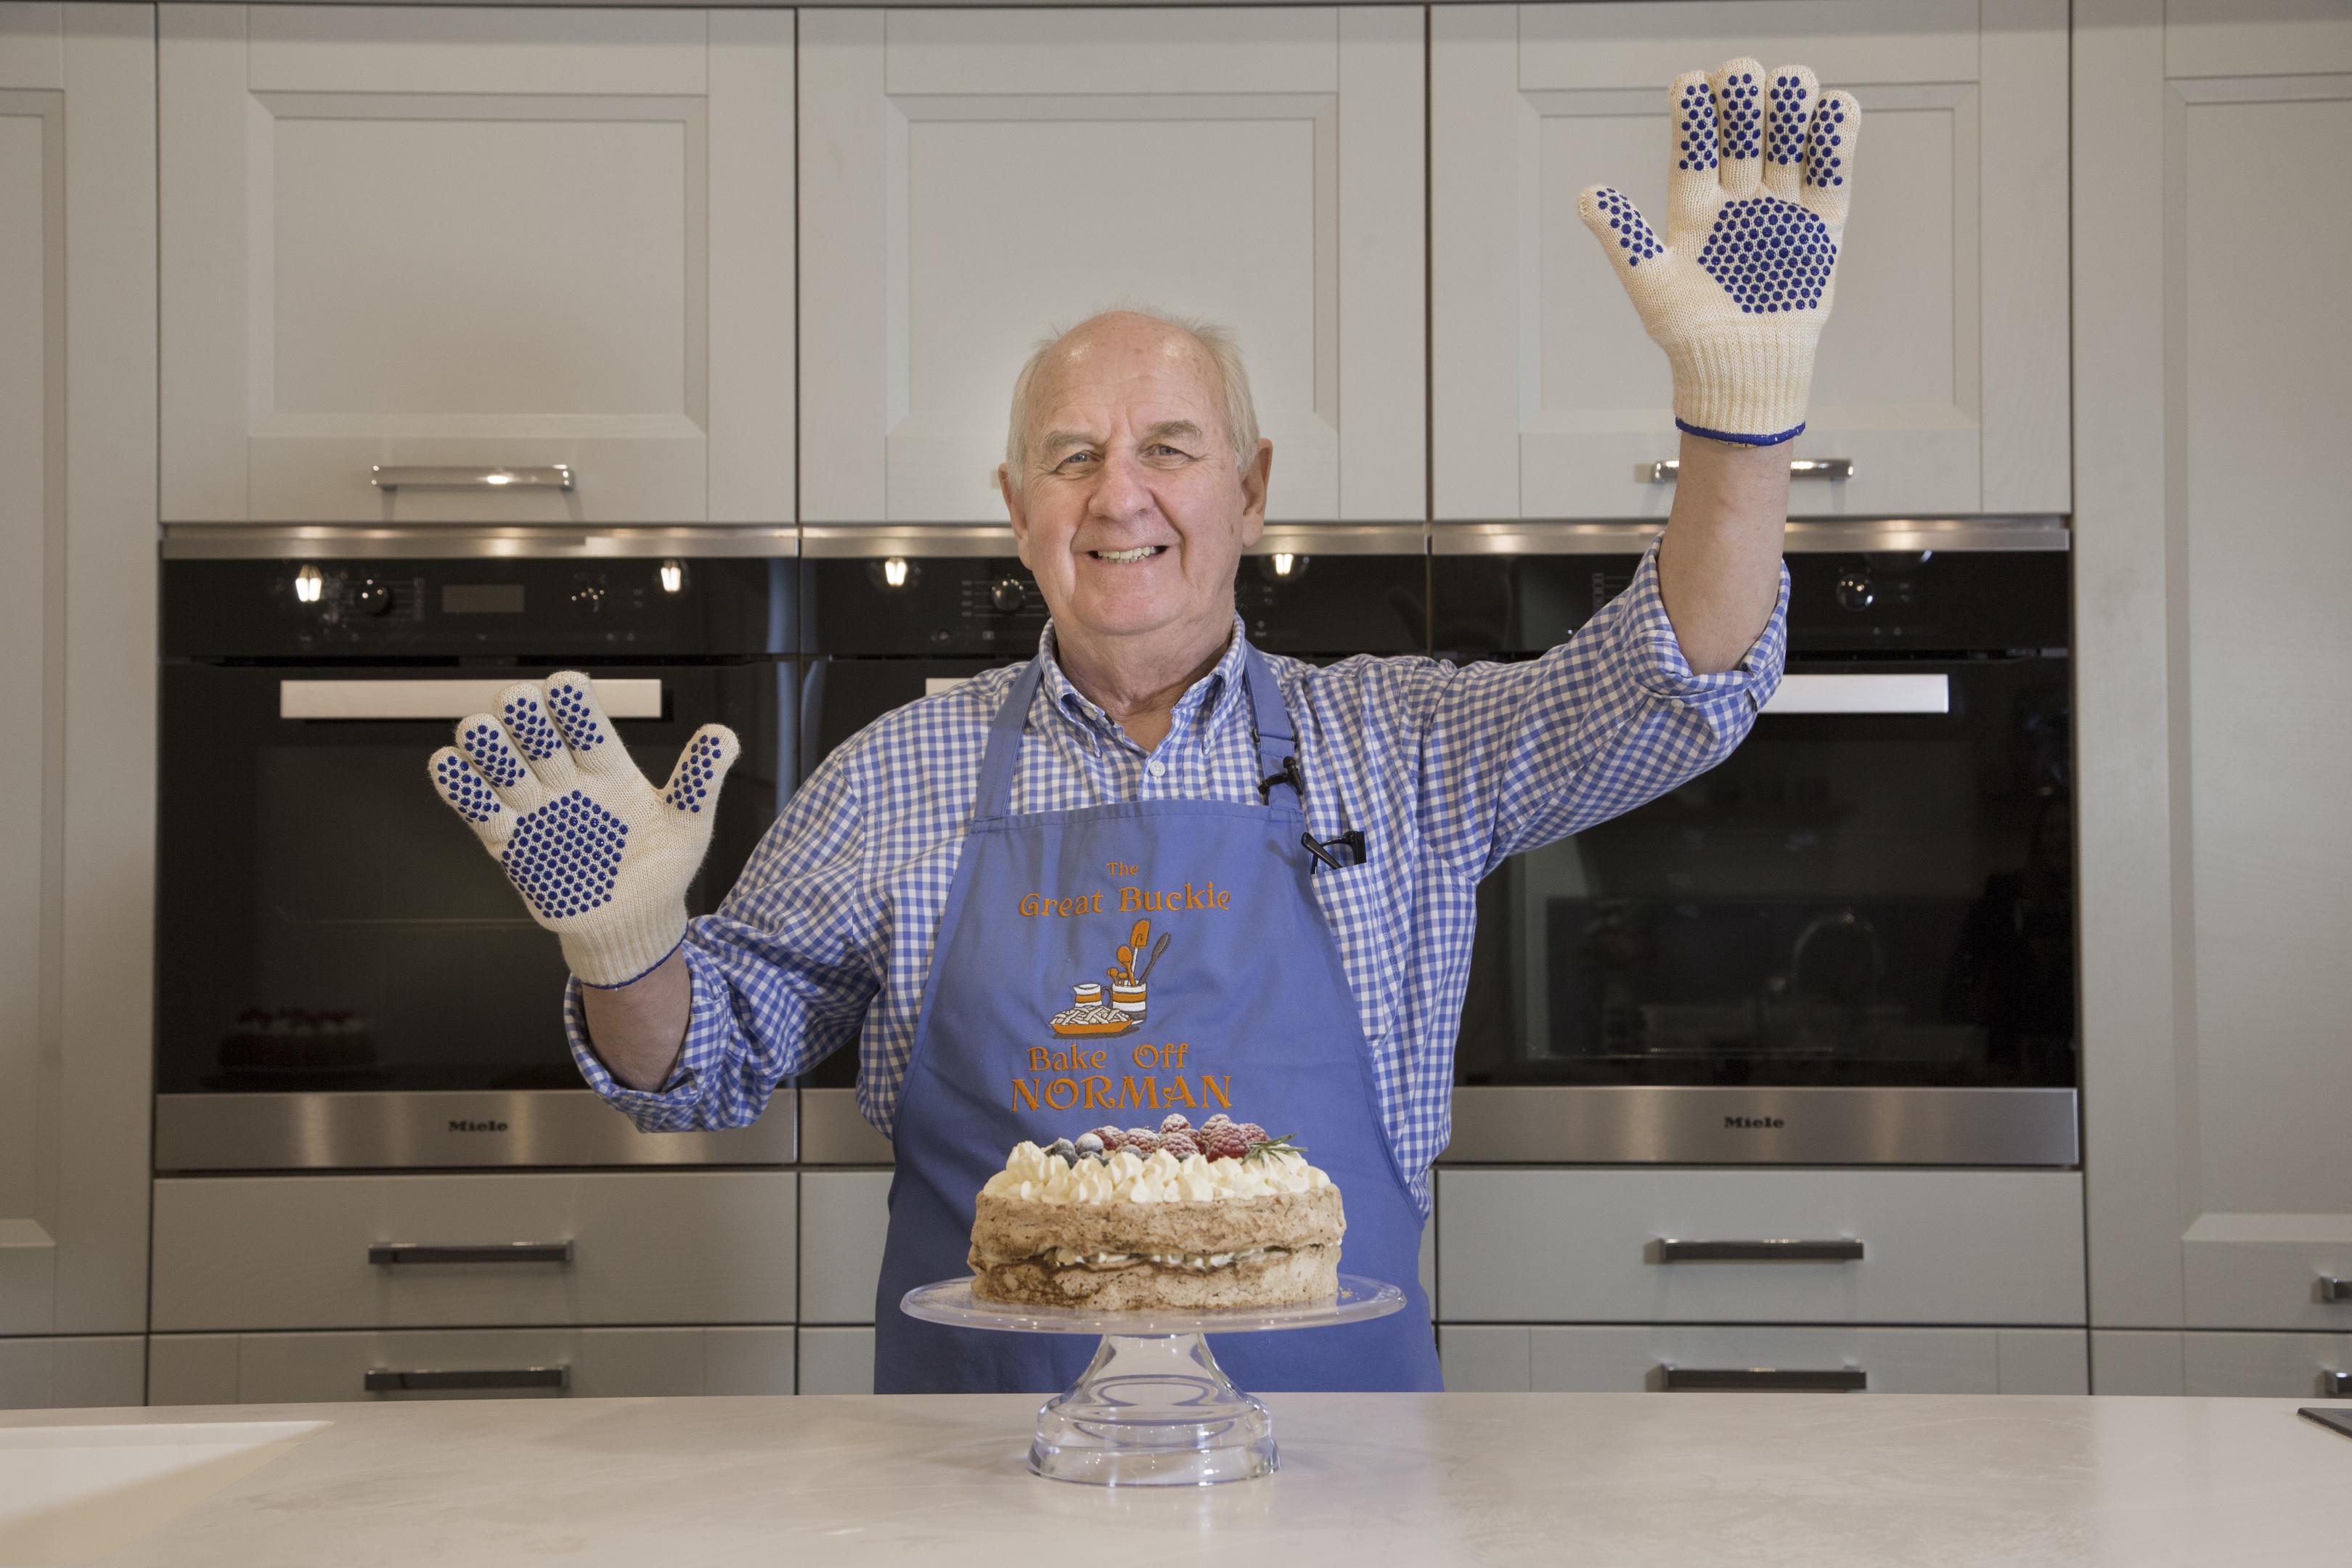 Norman Calder's Christmas dessert alternative